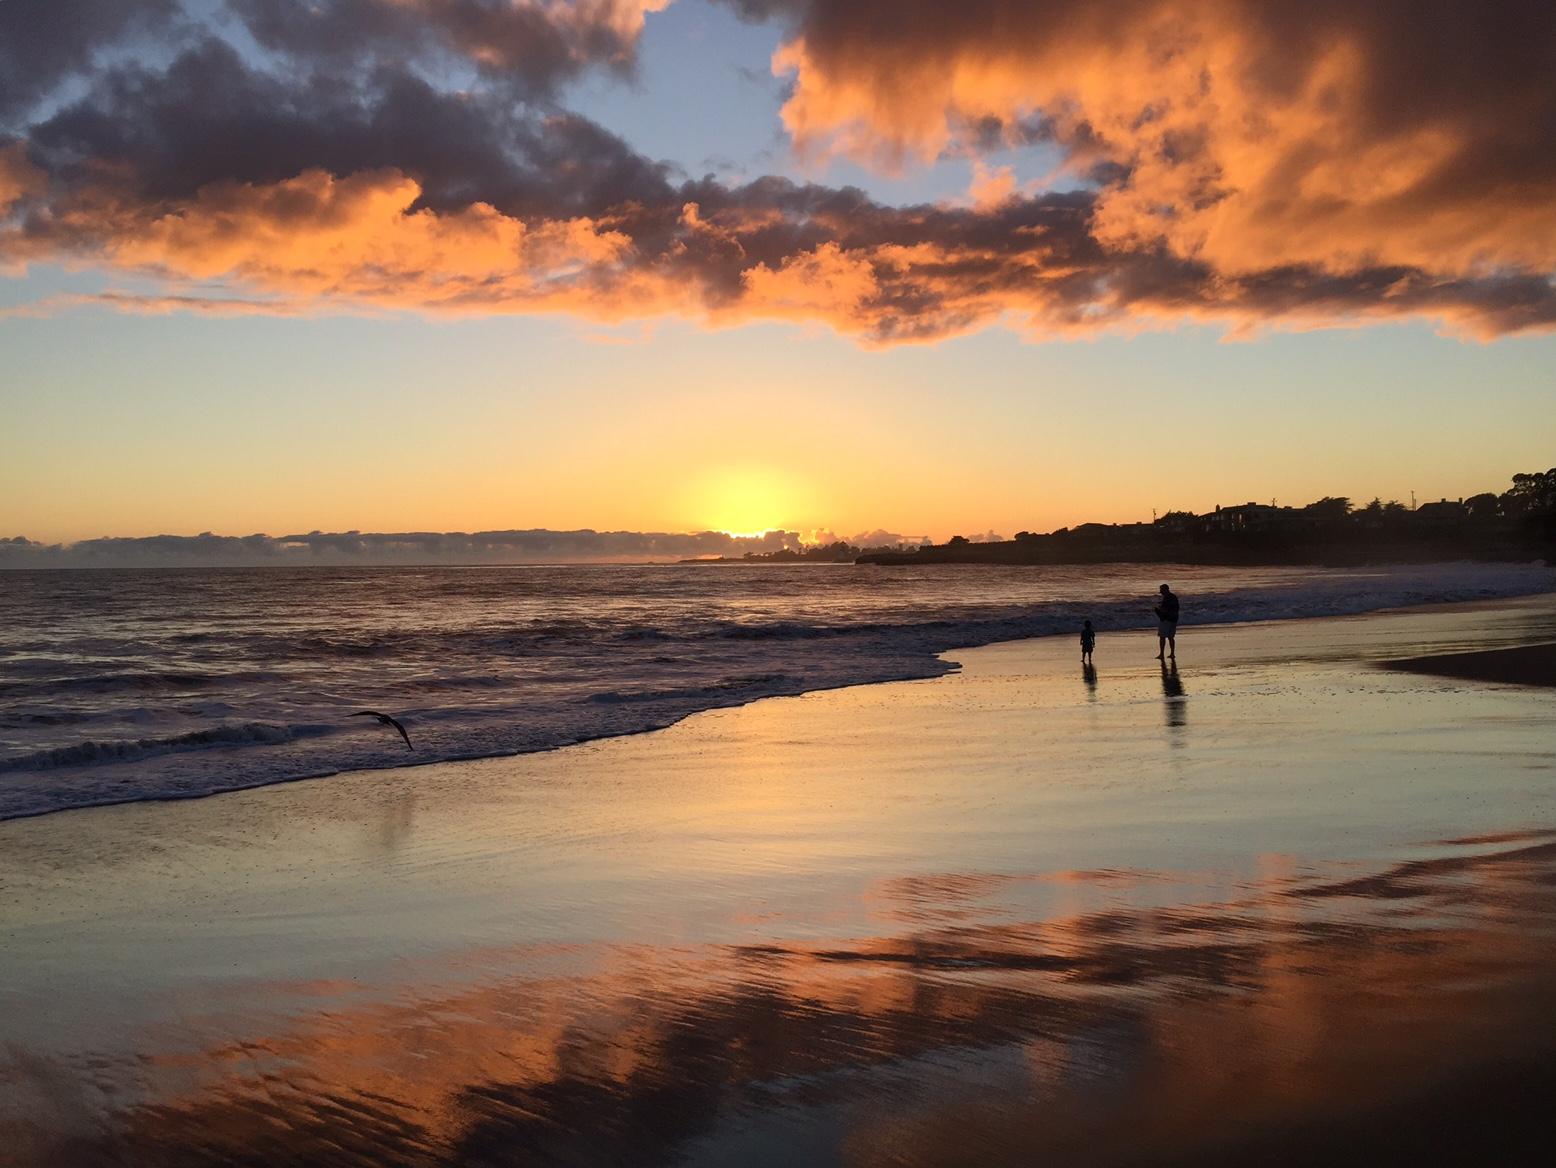 Corcoran Beach Sunset (landscape)